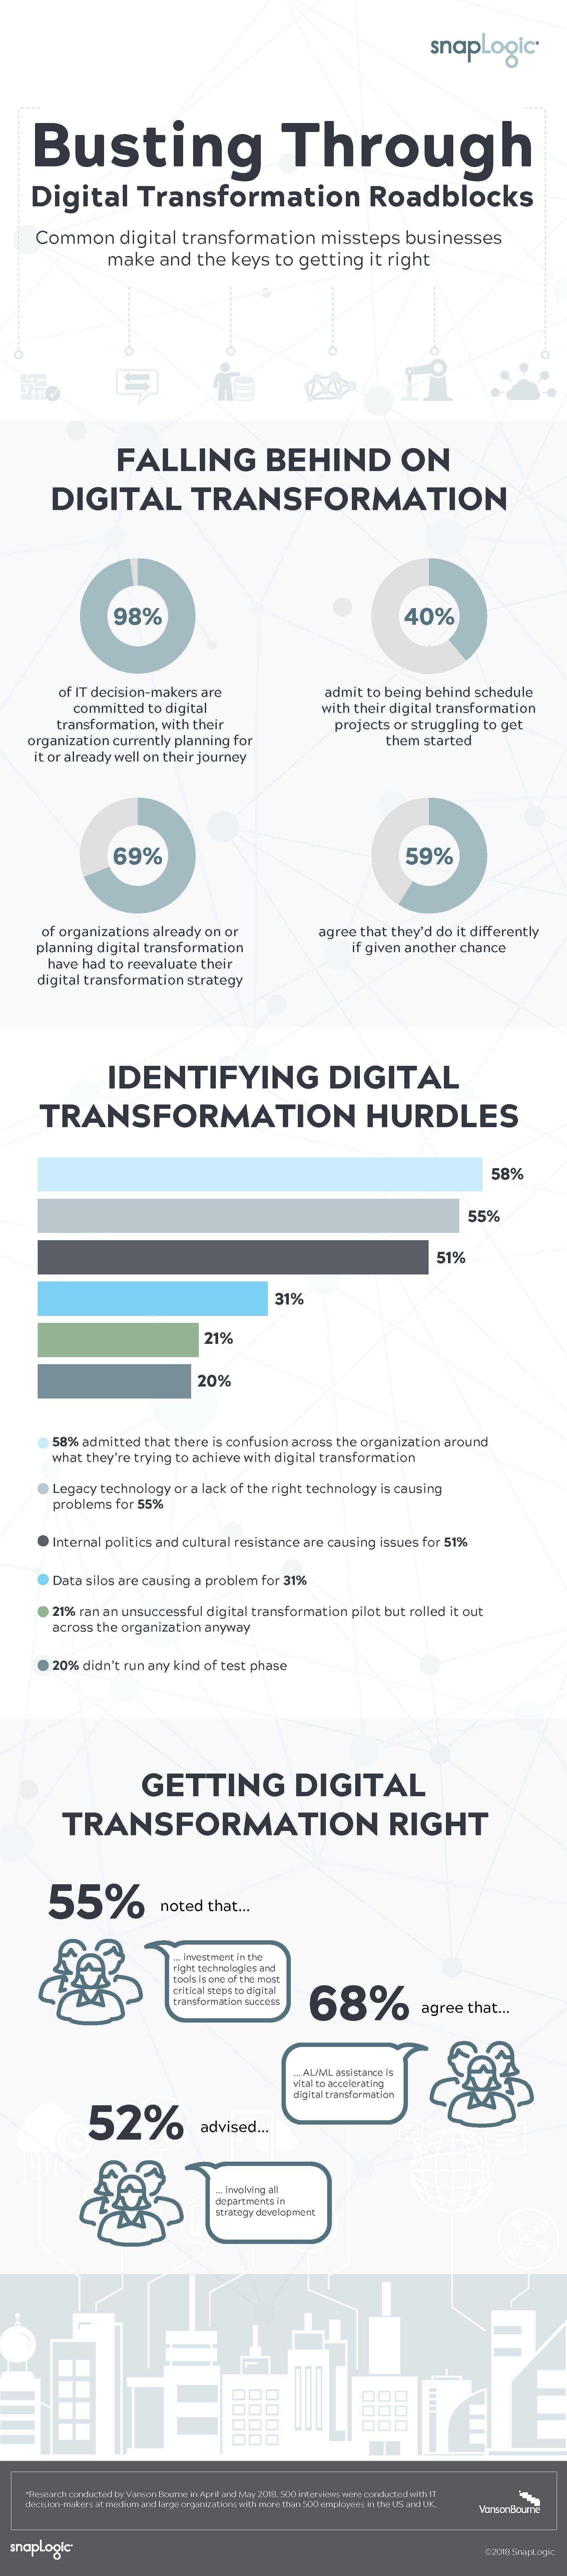 https://mms.businesswire.com/media/20181107005204/en/688959/5/Infographic_Digital_Transformation_Research_2018_FINAL.jpg?download=1